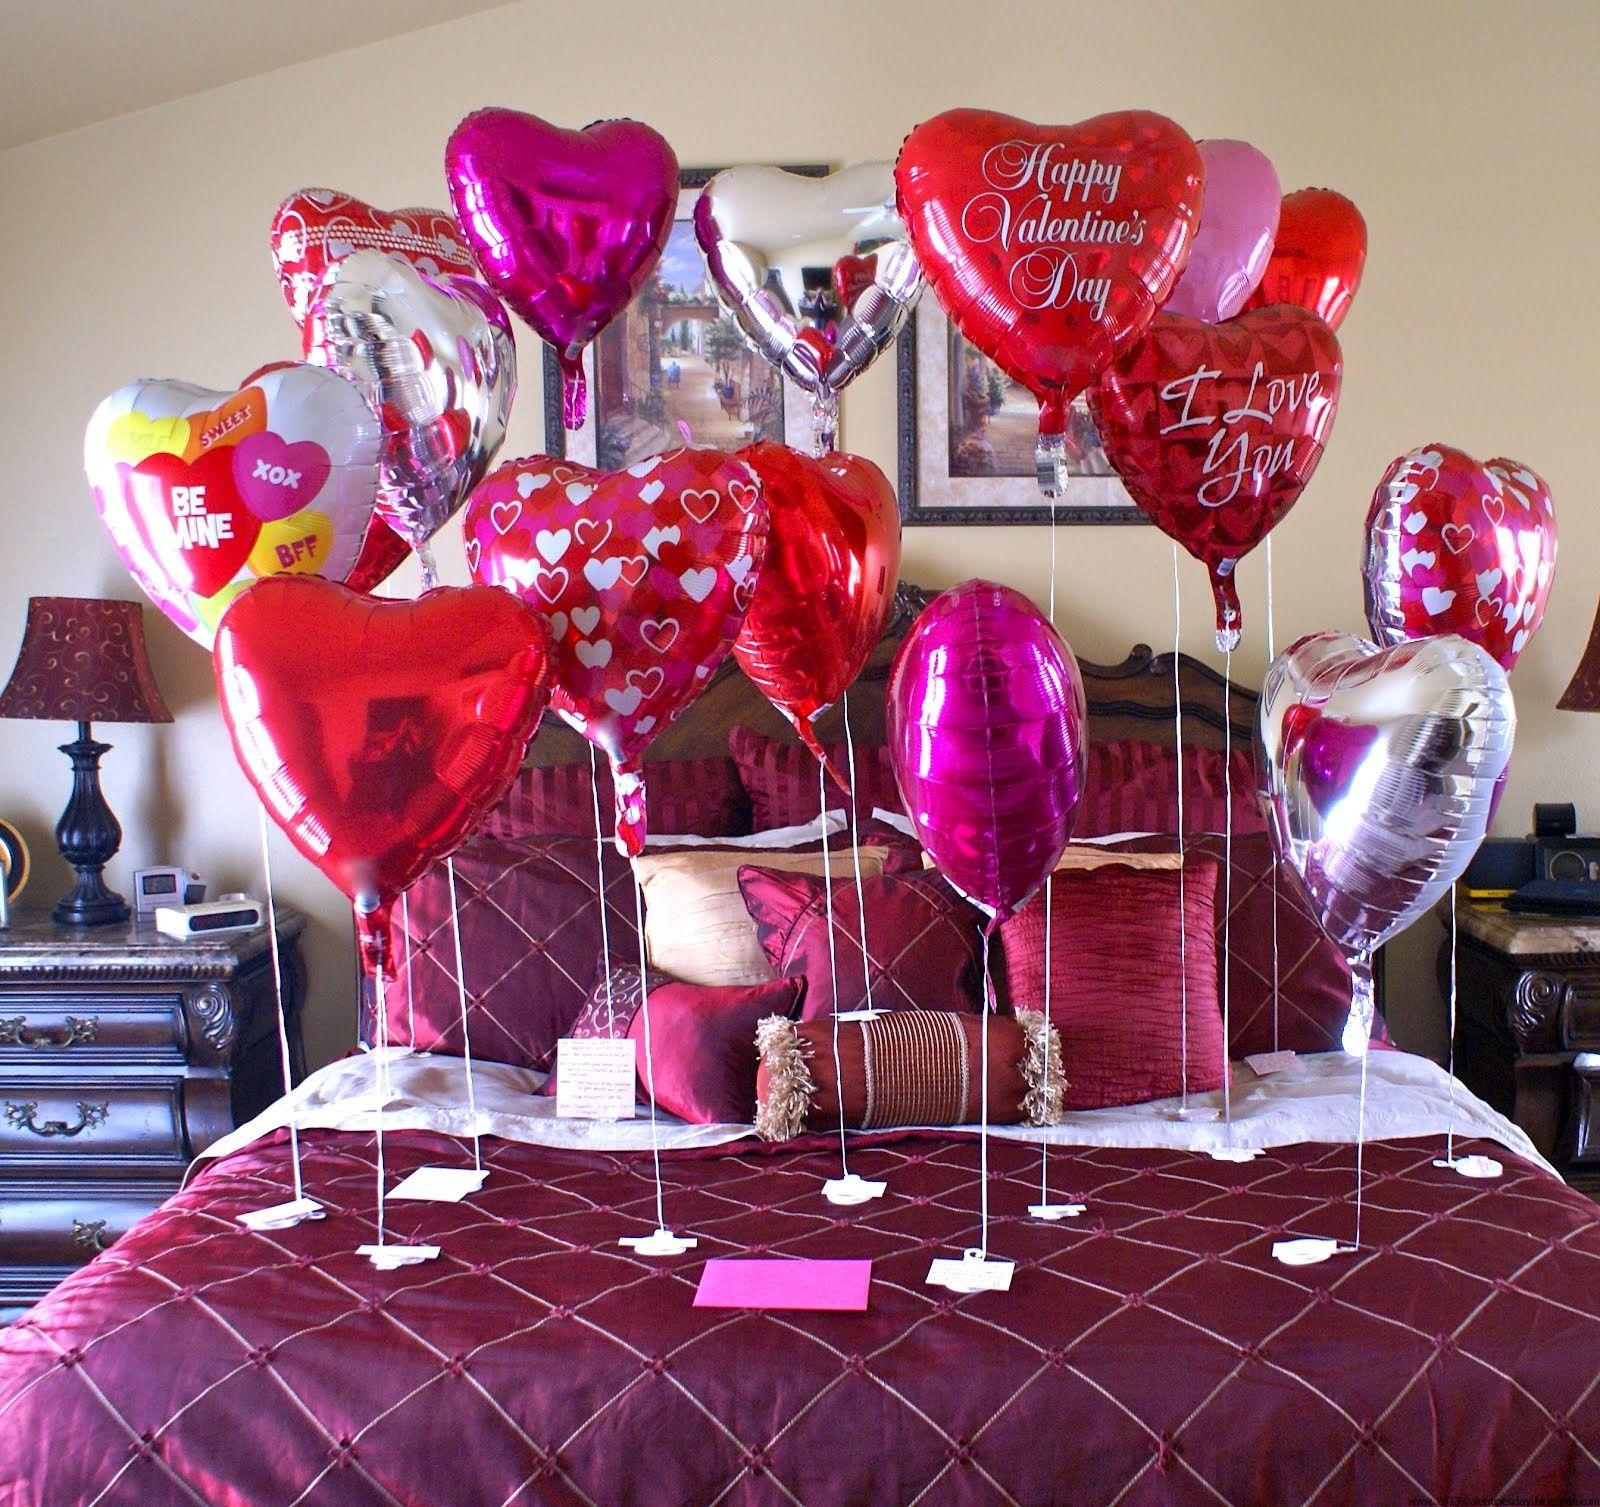 Valentine decoration ideas valentine 39 s day bed for Valentines room decor